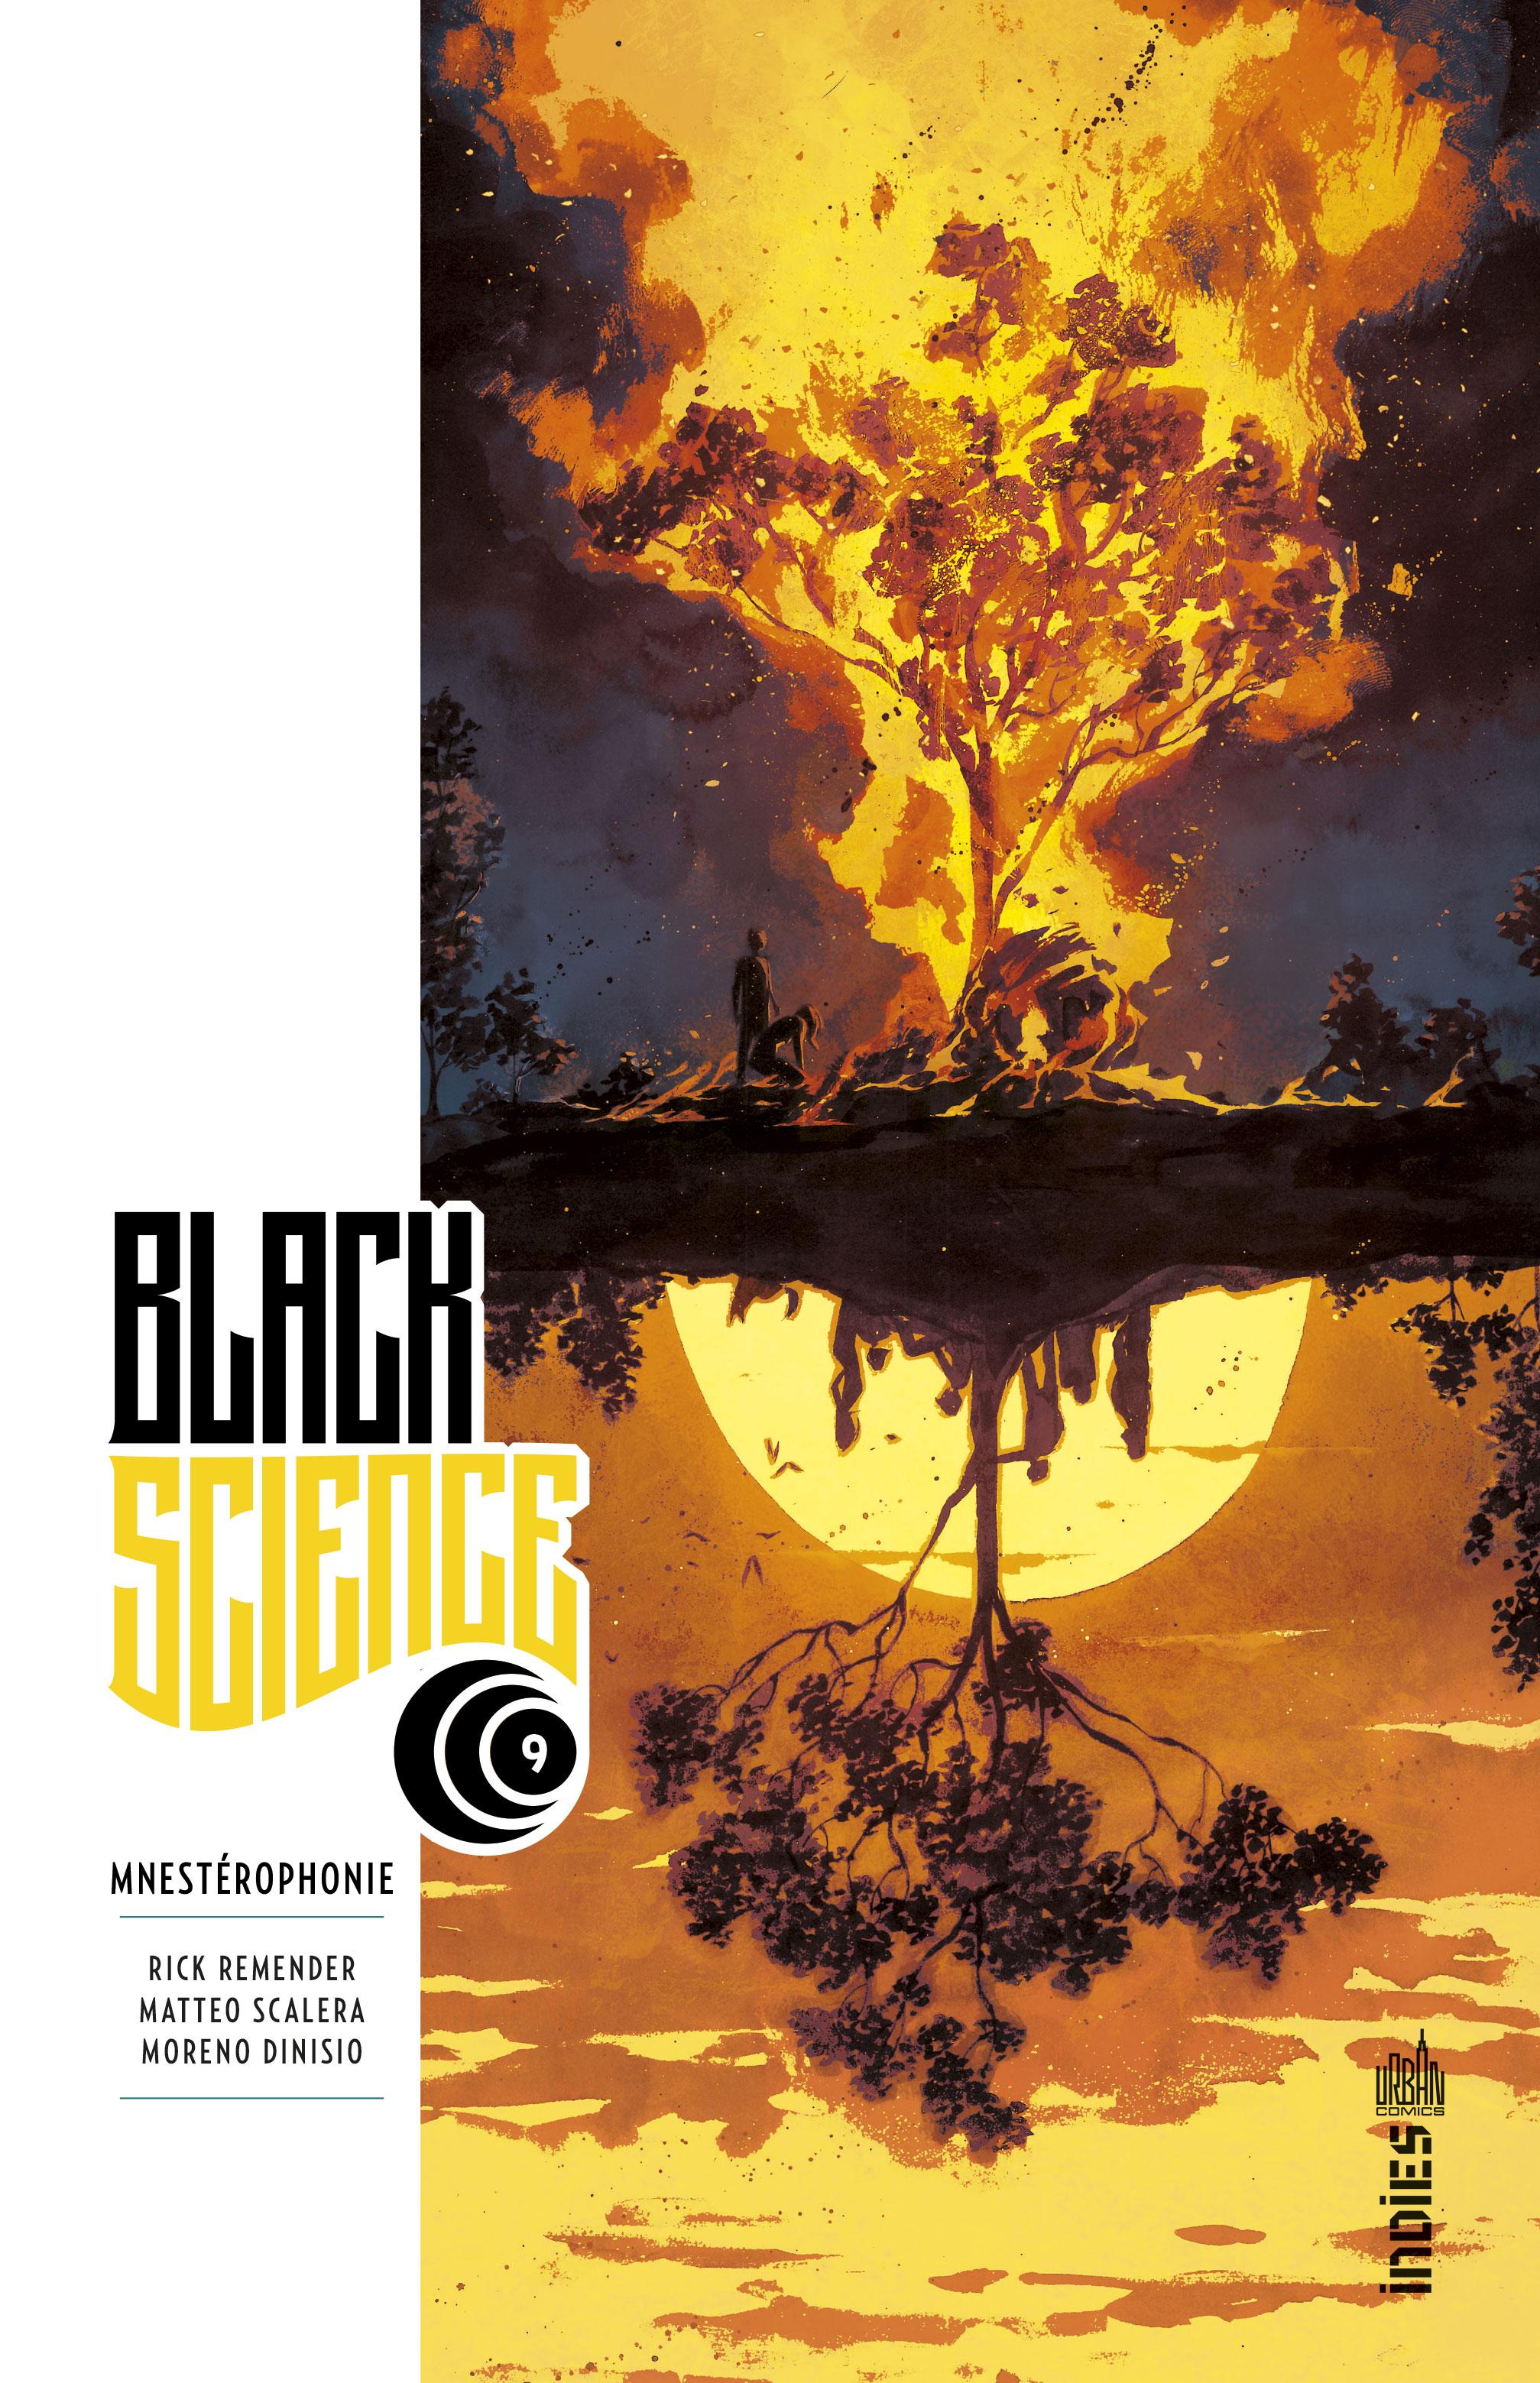 Black Science 9 - Mnestérophonie